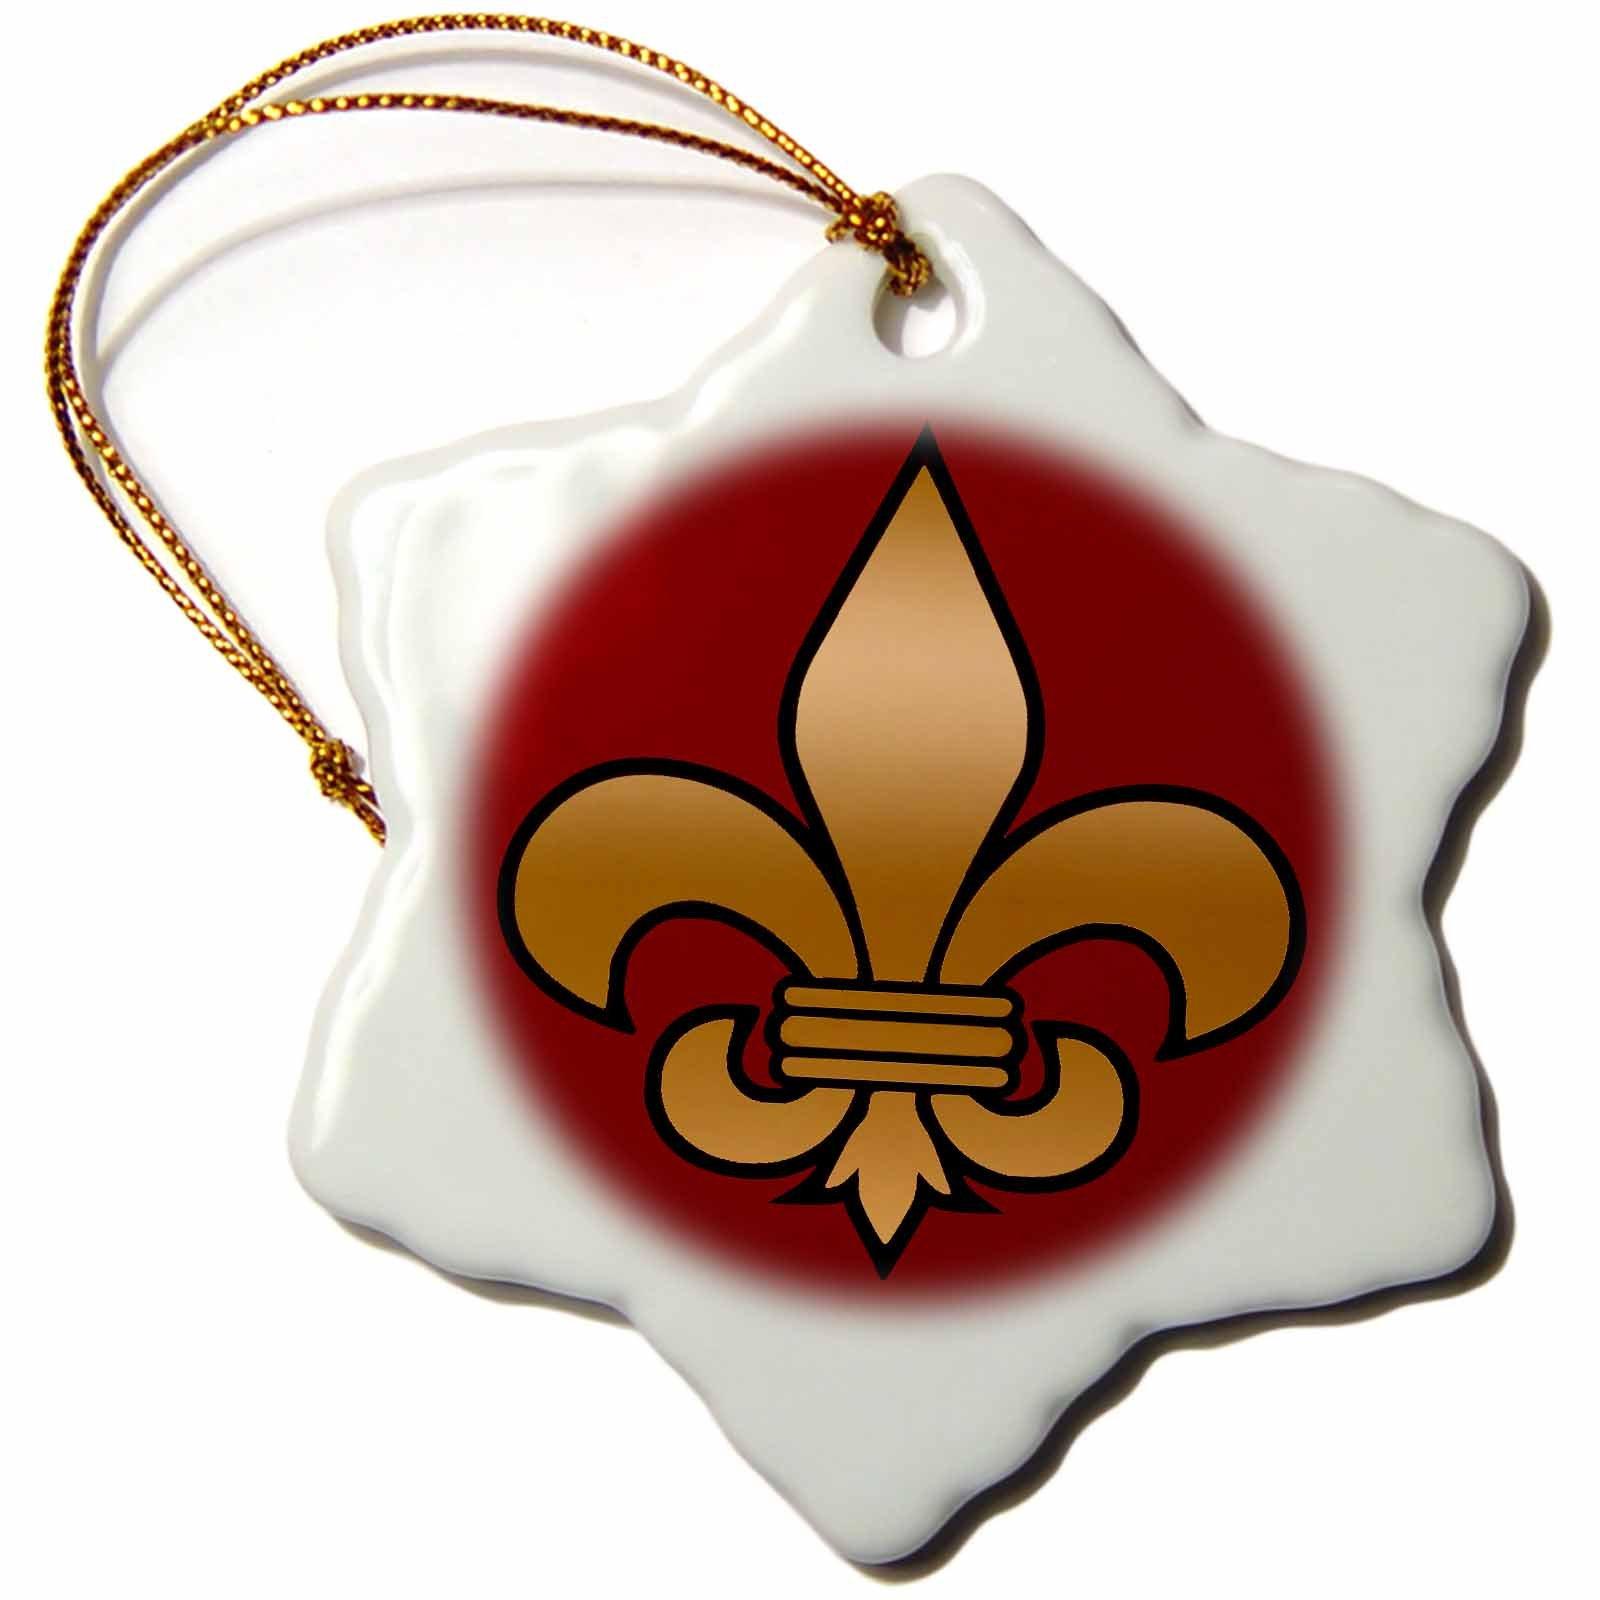 3dRose Large Black and Gold Fleur De Lis on Maroon Background Christian Symbol Snowflake Ornament, 3''